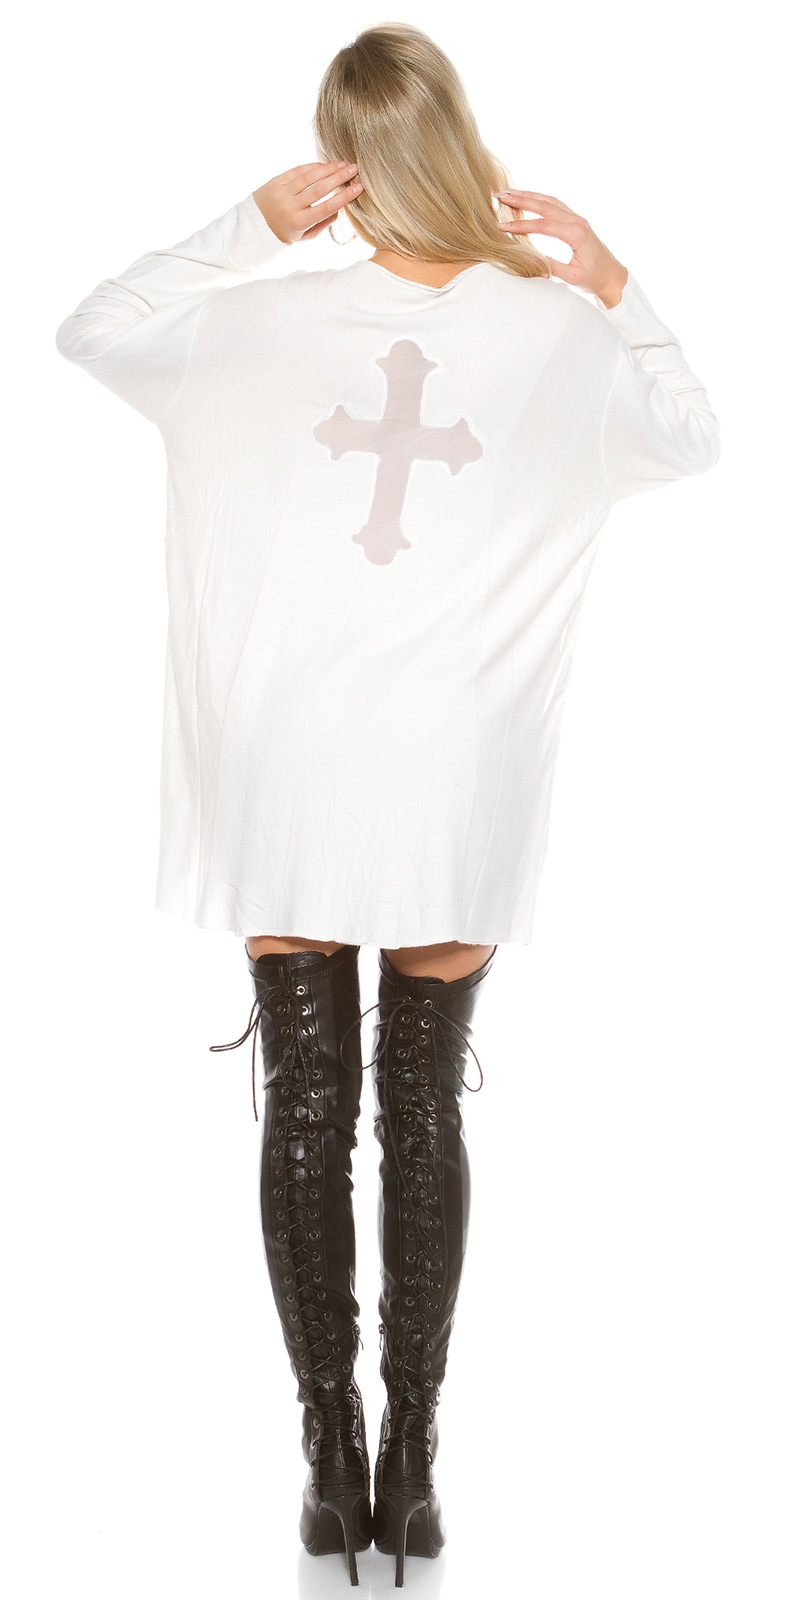 Pulover la moda supradimensionat cu plasa Cross